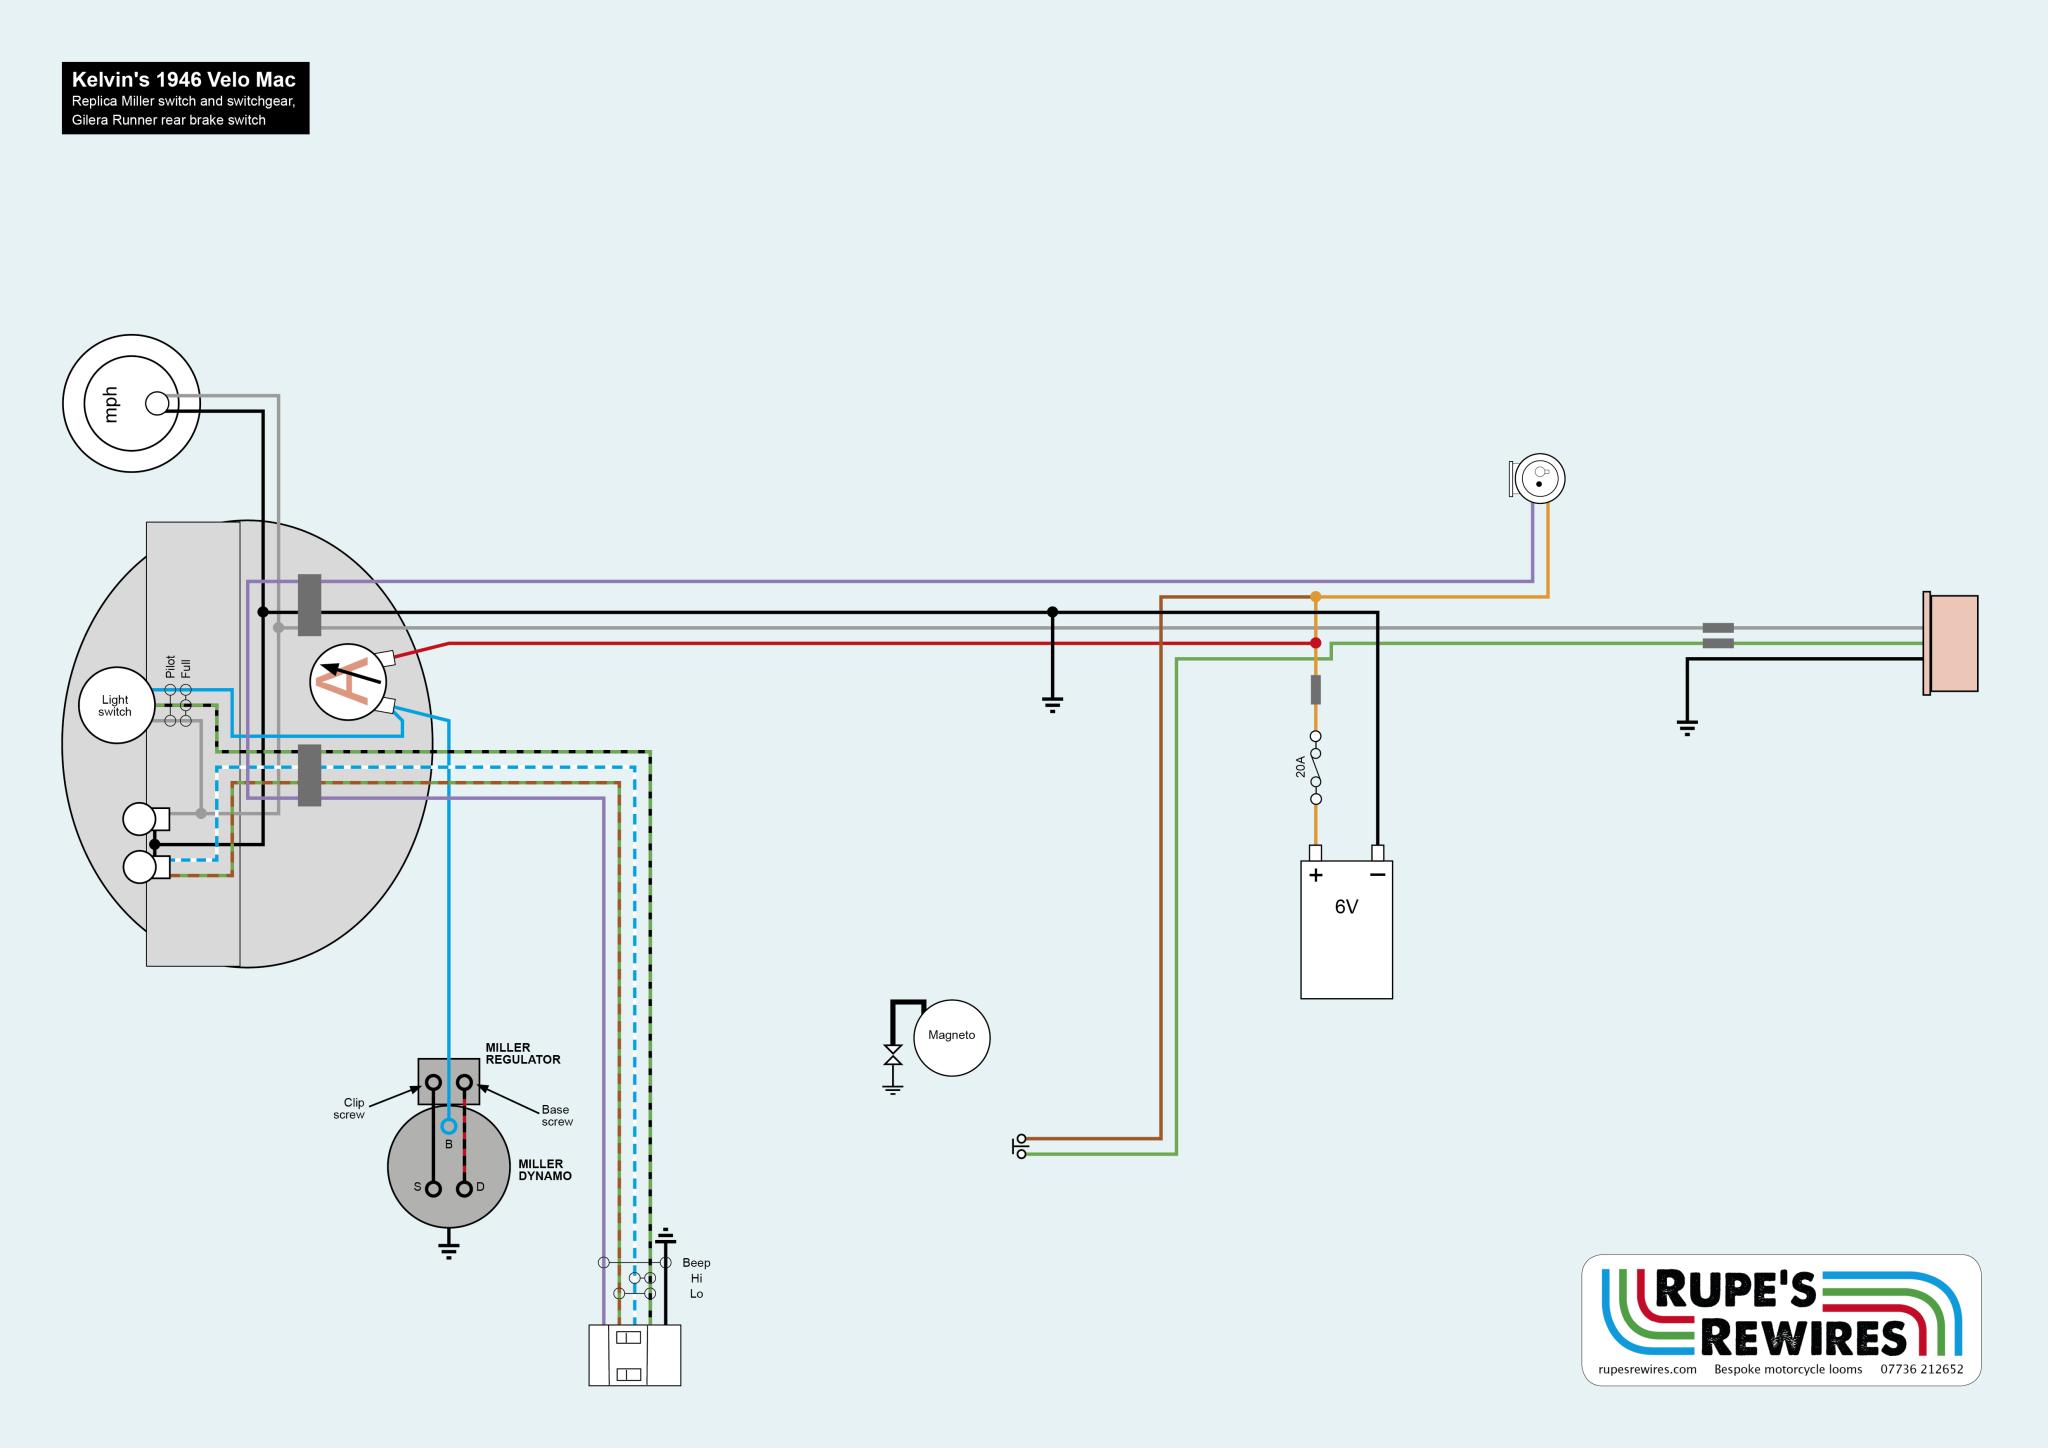 Kelvins velo mac 500 rupes rewires kelvins velo asfbconference2016 Gallery